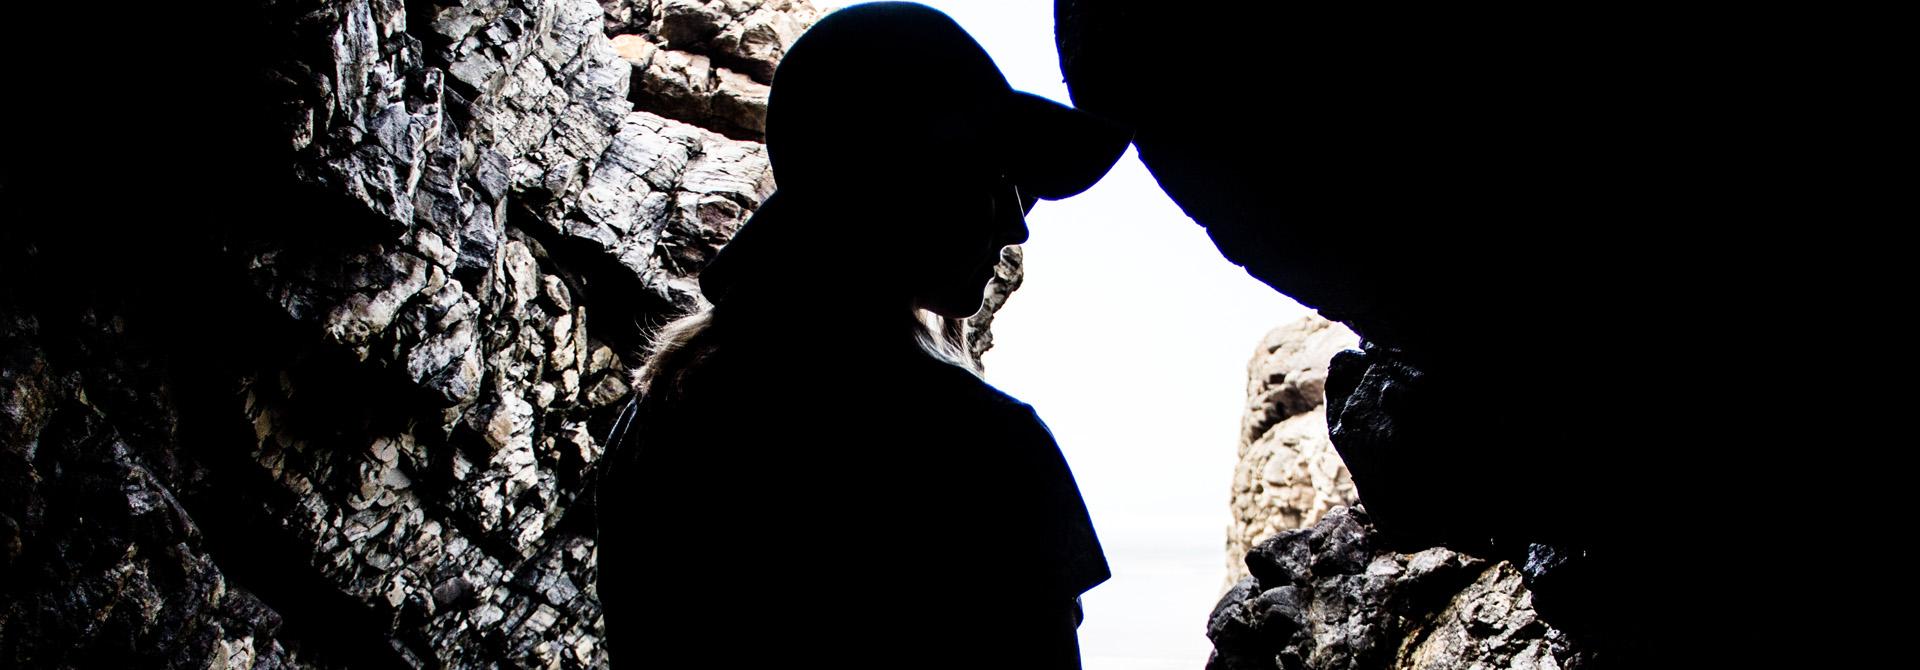 girl-in-cave